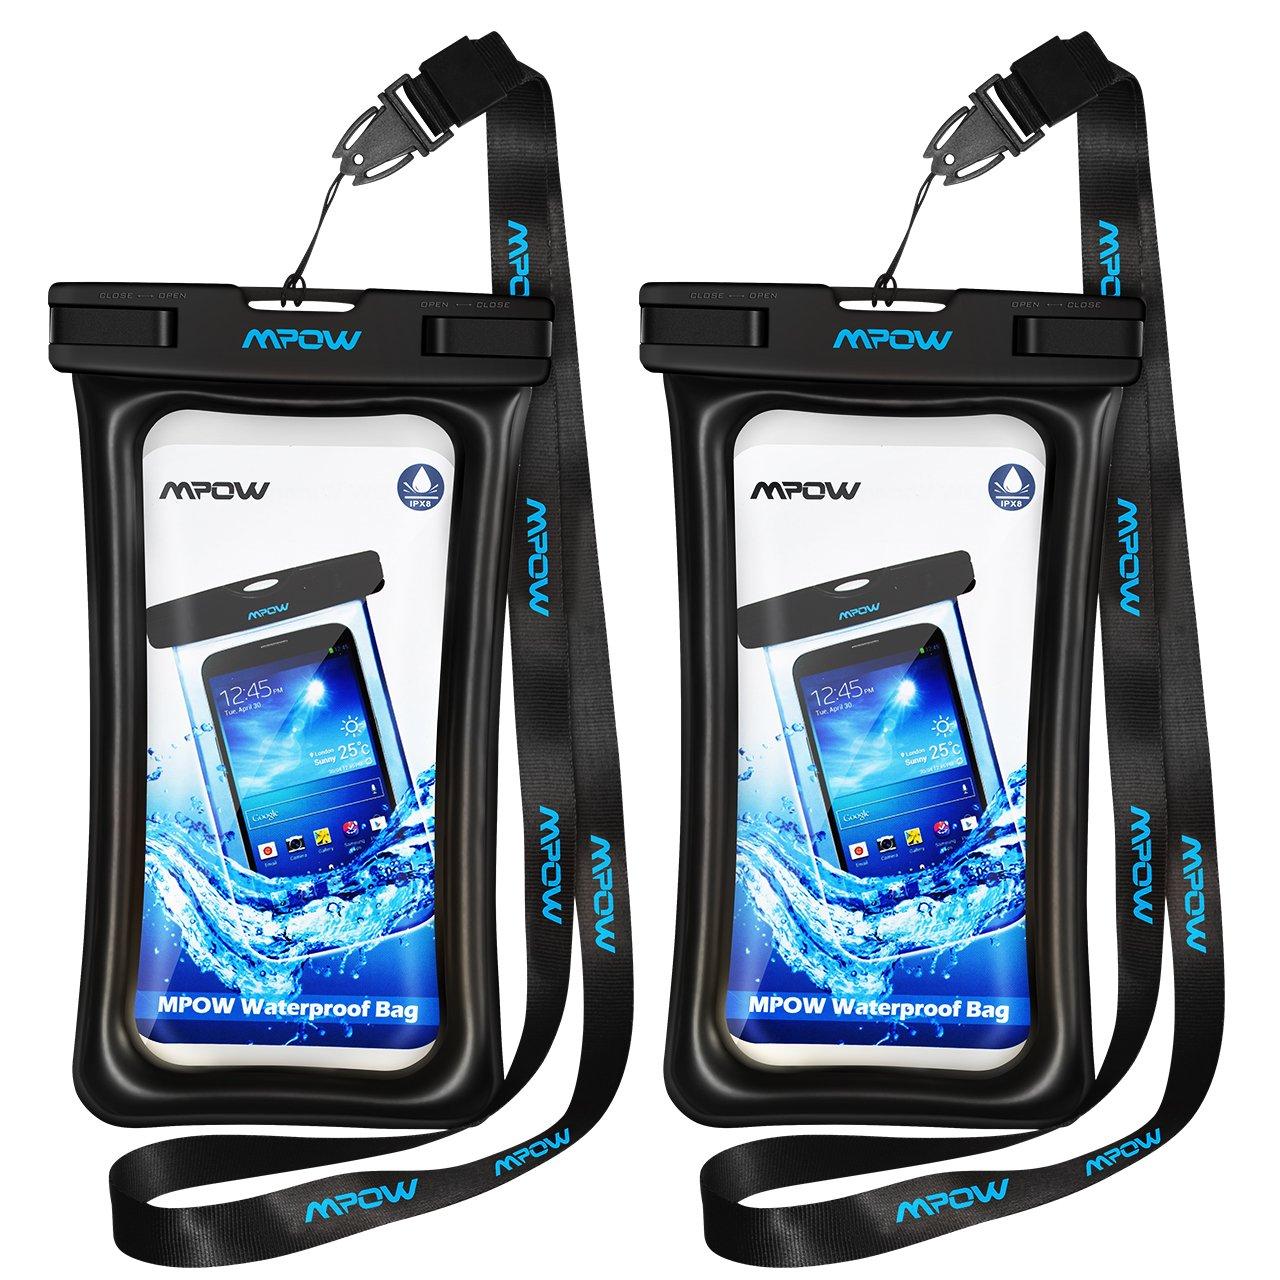 Mpow - Funda Impermeable para Smartphone, IPX8, Universal, Impermeable, Bolsa Seca bajo el Agua, Compatible con iPhone XS Max/XR/X/8/7/Galaxy S10/S9/S8/Mate 20/P30/P20 hasta 6,5 Pulgadas: Amazon.es: Electrónica